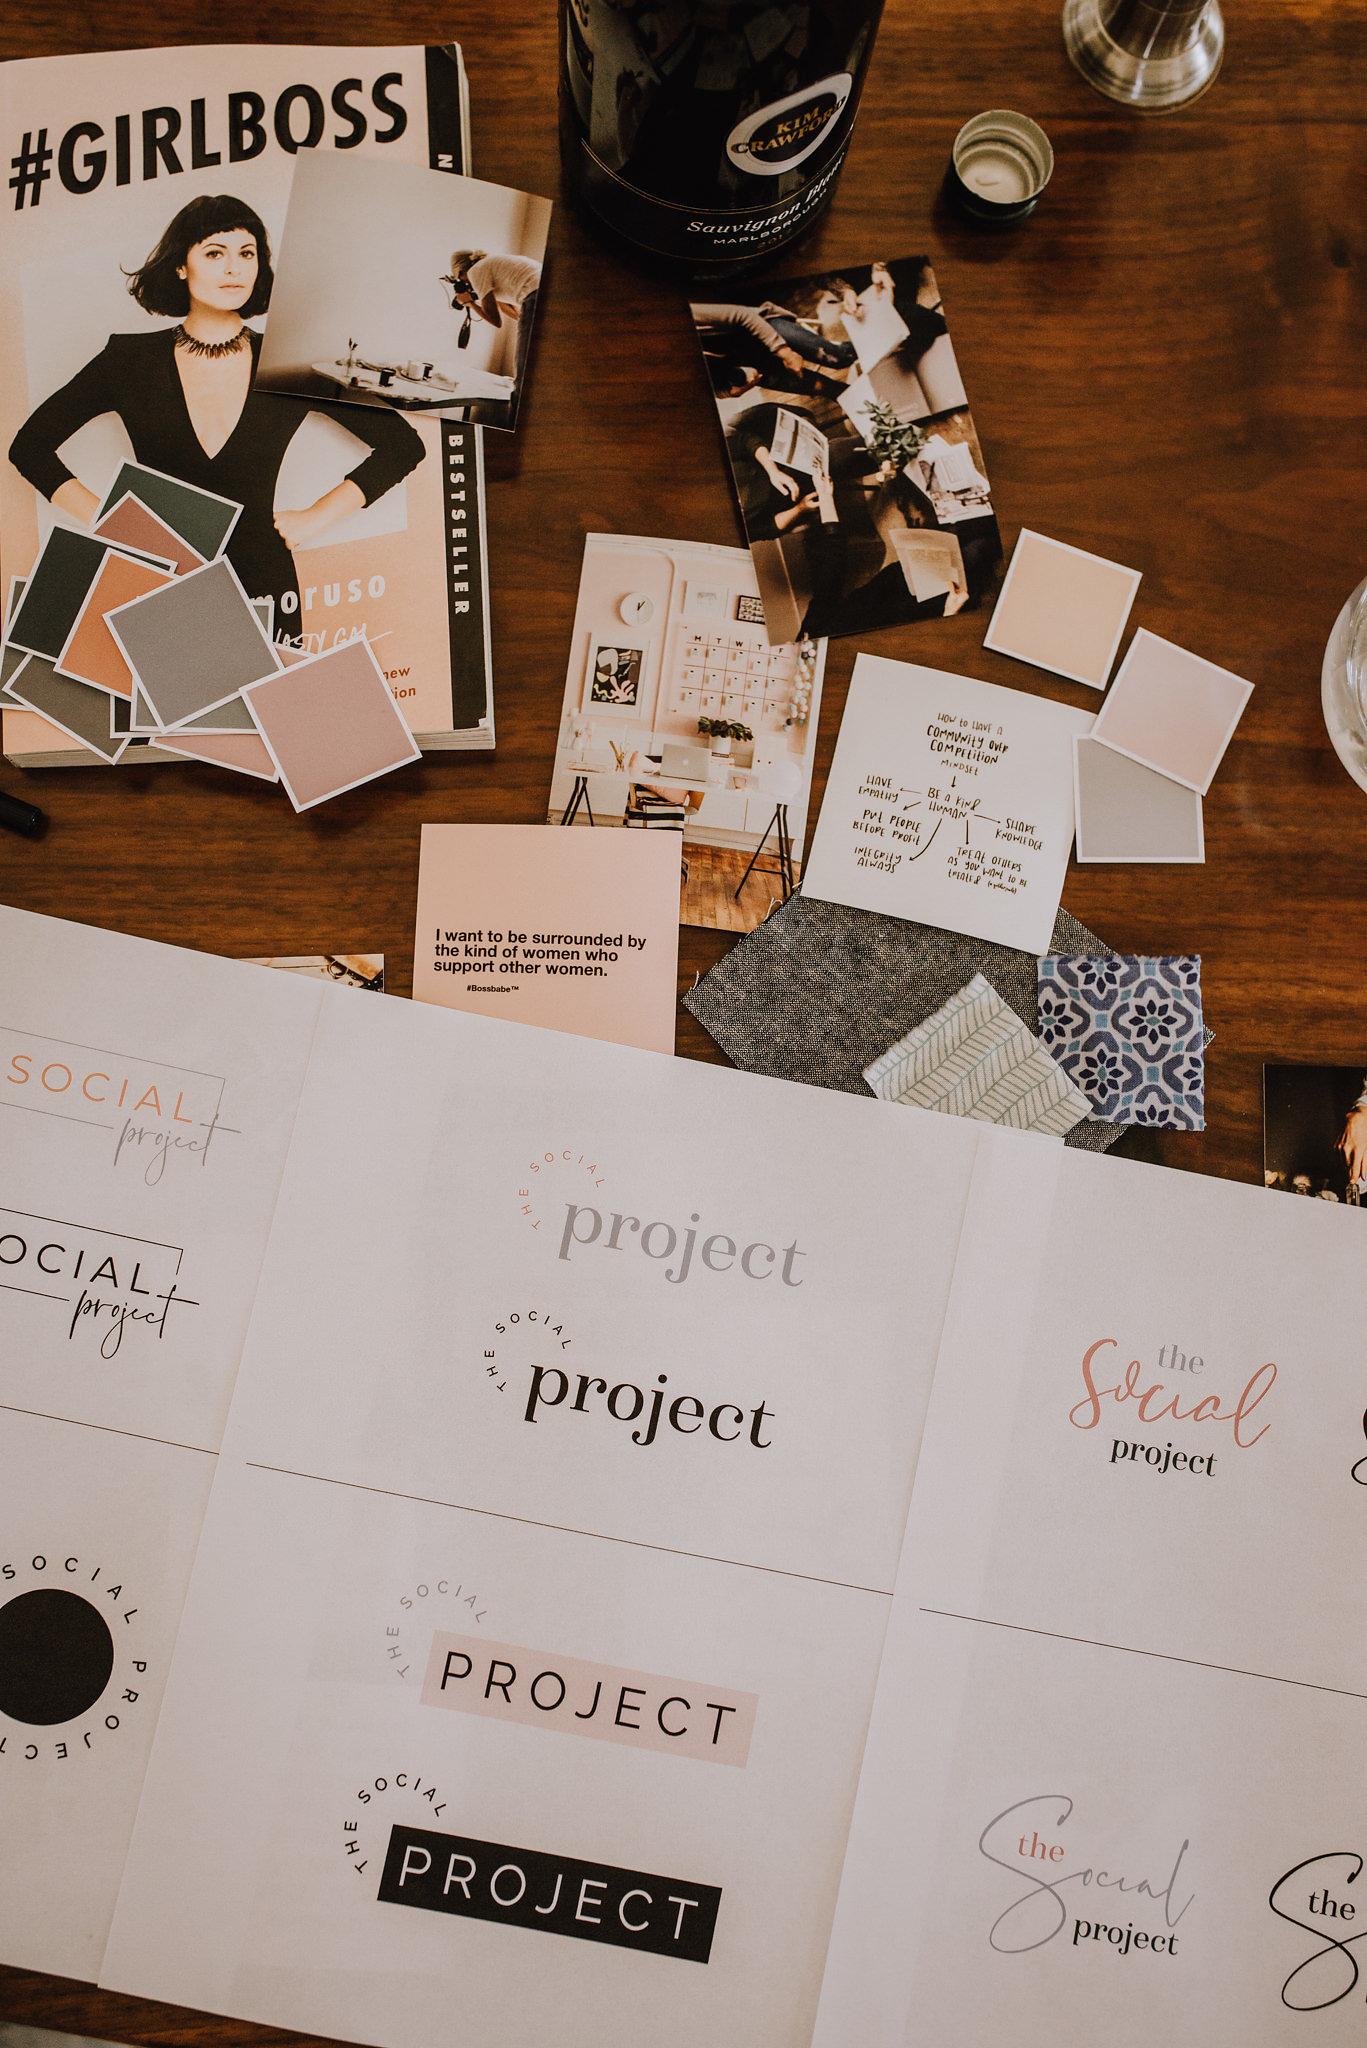 The Social Project, Barrie Social Project, Barrie Social, Branding, Social Media, Creative, Creative Collaboration, Girl Boss, Barrie Boss Babes, Entrepreneurs, Graphic Design, Mood Board, Branding Process